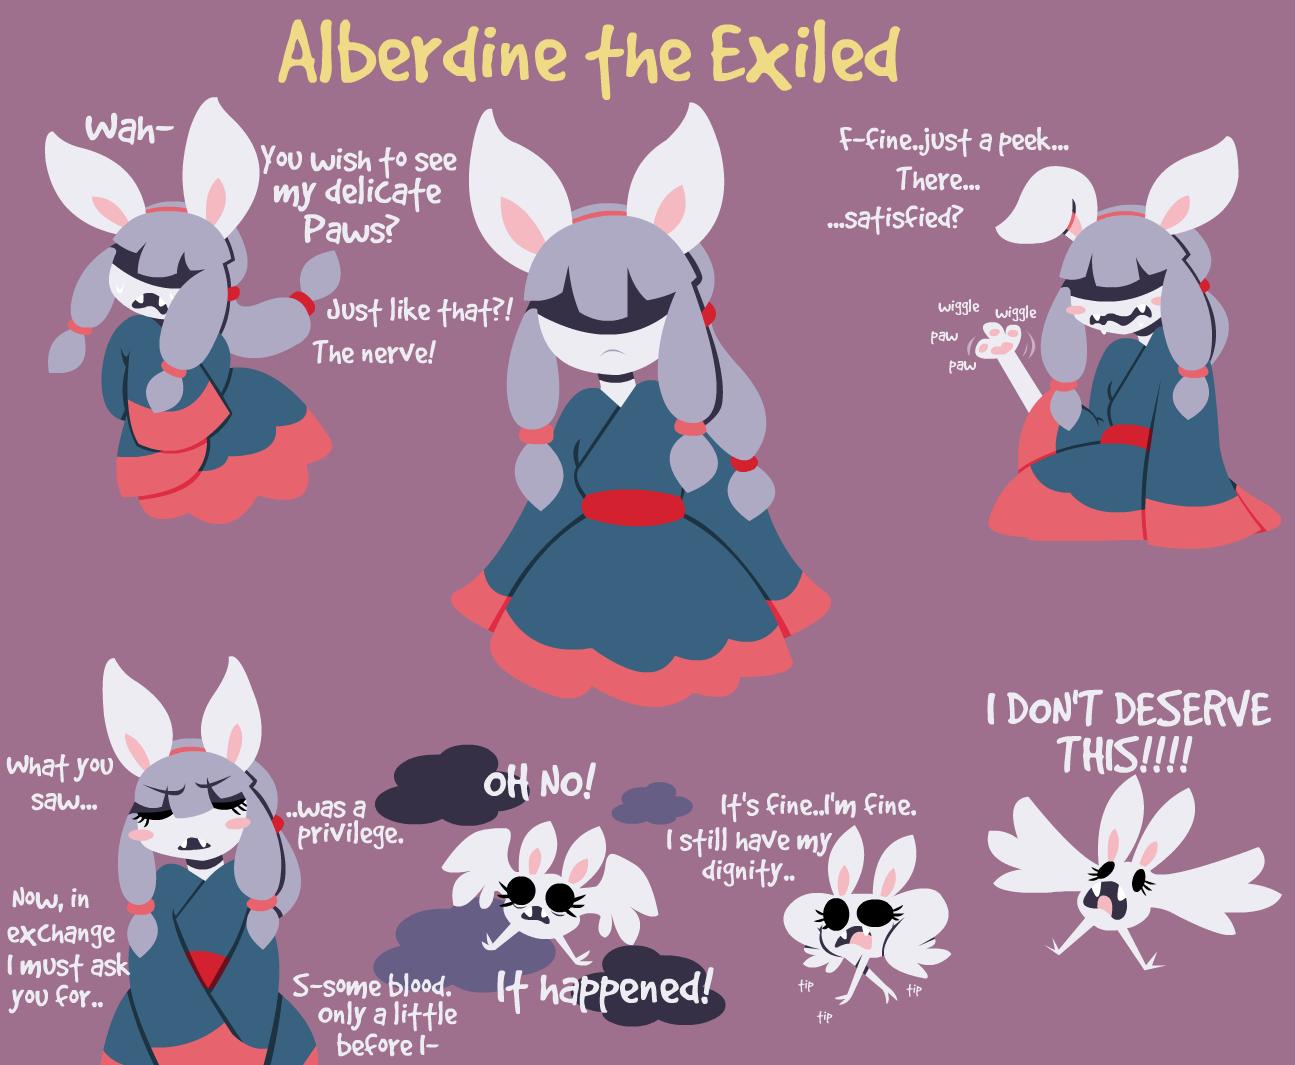 Alberdine the Exiled